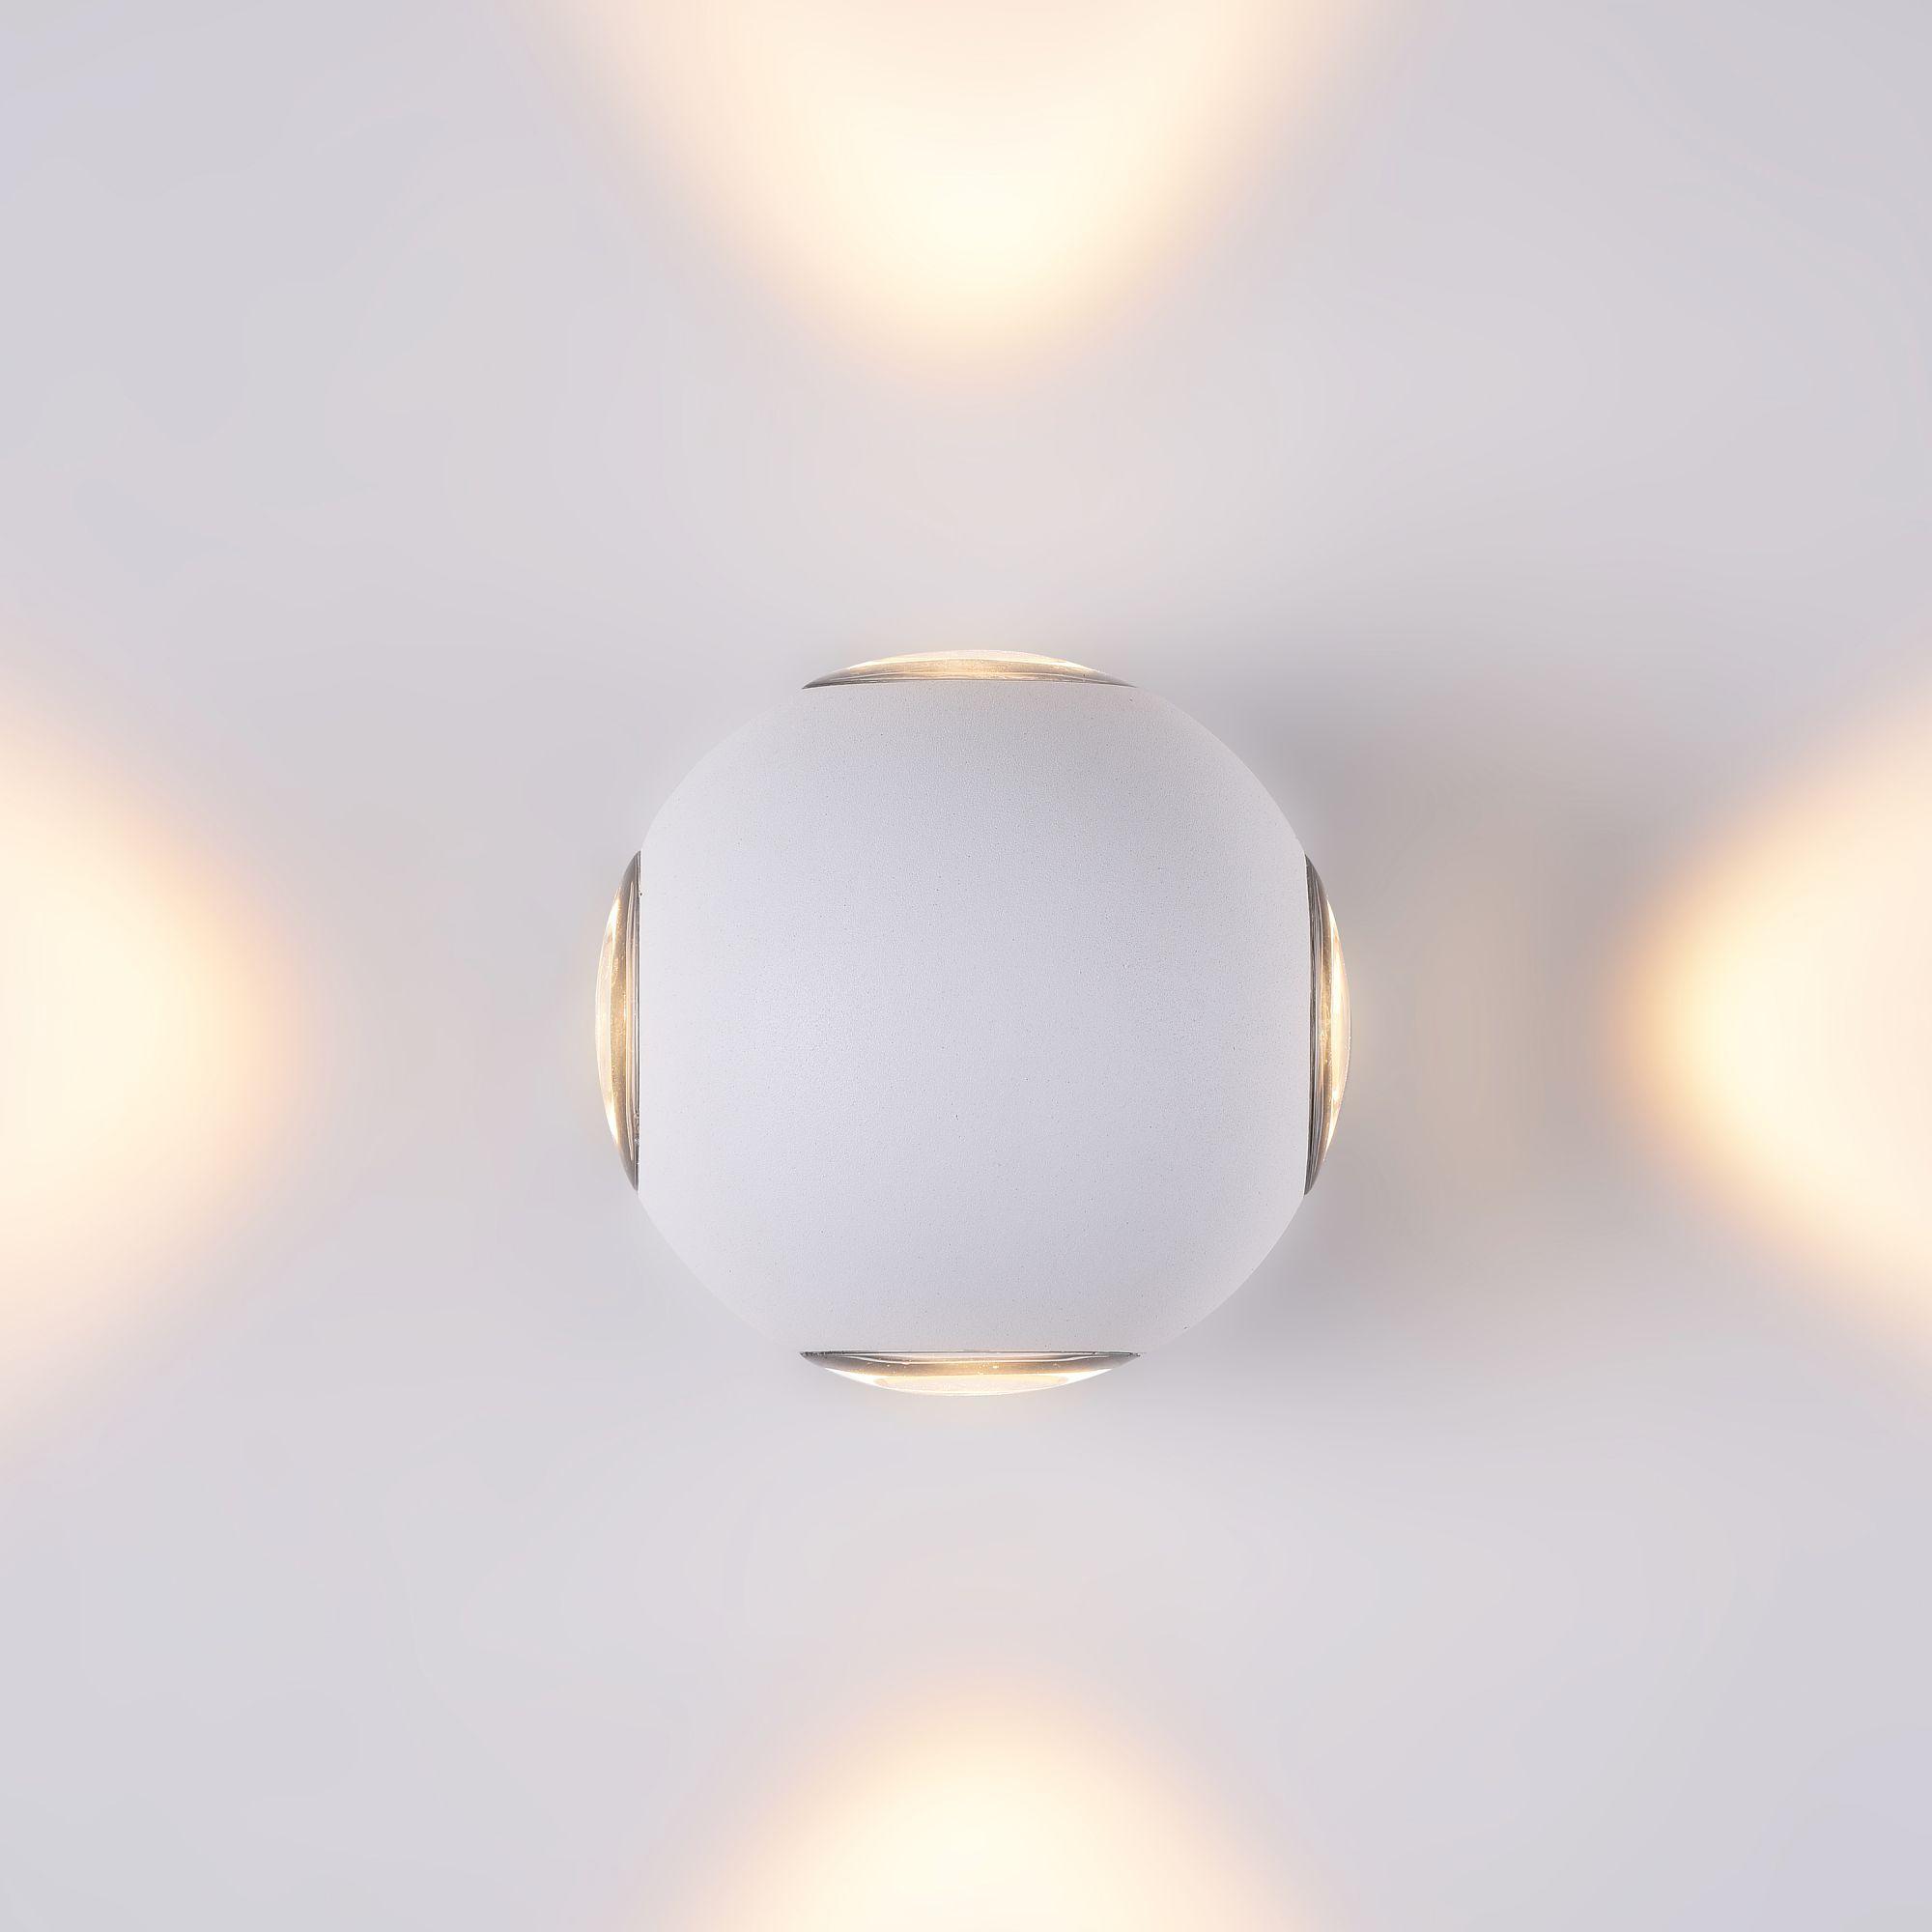 Настенный светильник Maytoni O575WL L12W